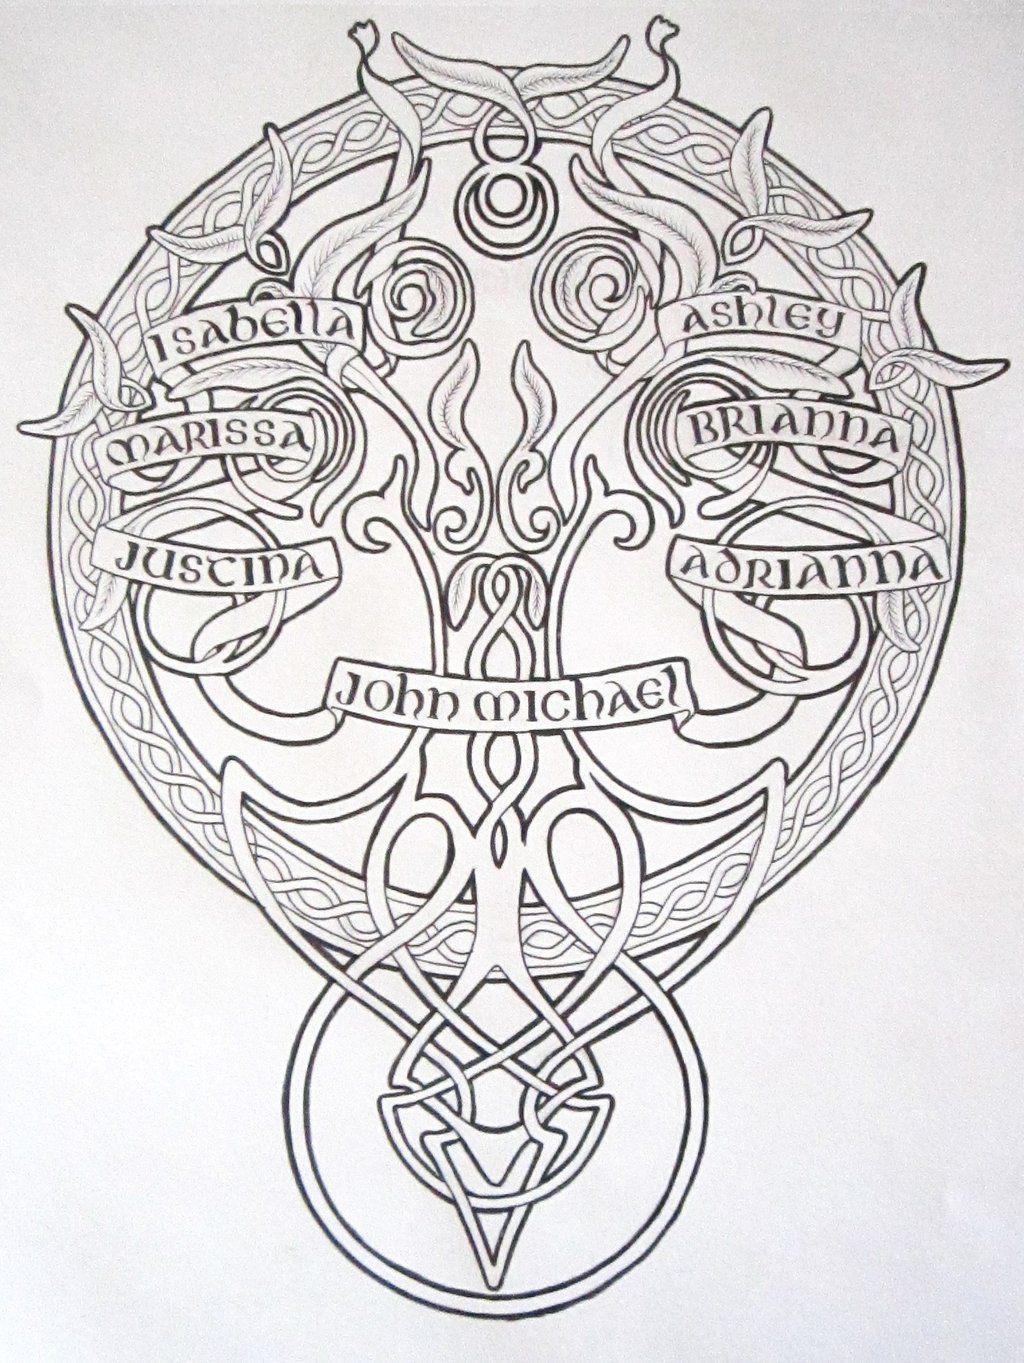 Celtic family tree symbol images symbol and sign ideas celtic family tree symbol image collections symbol and sign ideas celtic family tree pasoevolist celtic family buycottarizona Gallery